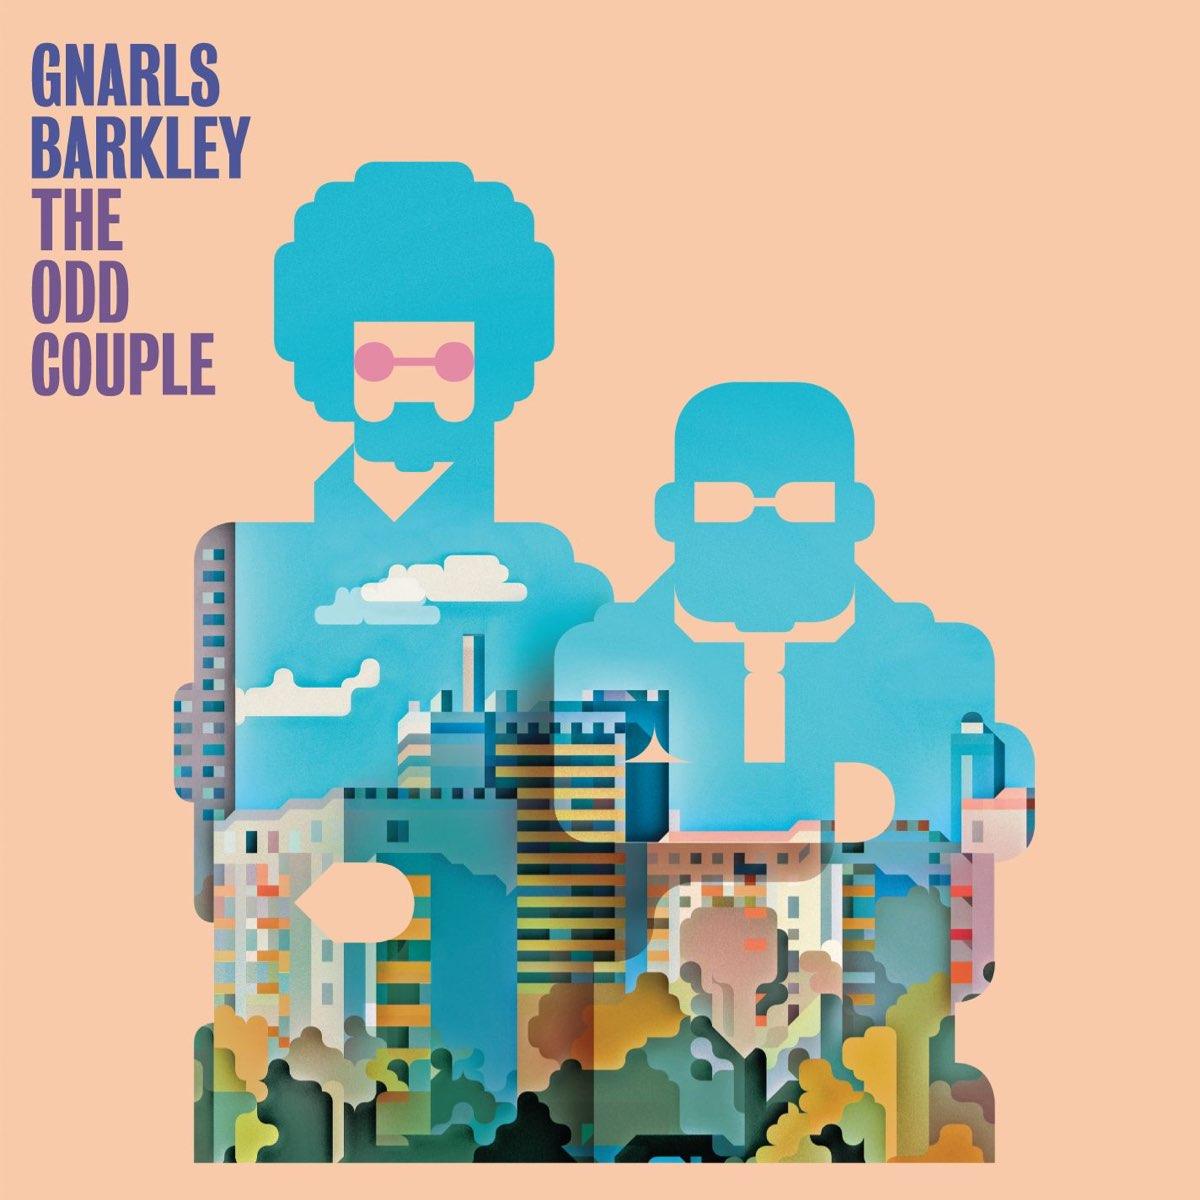 Gnarls Barkley, The Odd Couple